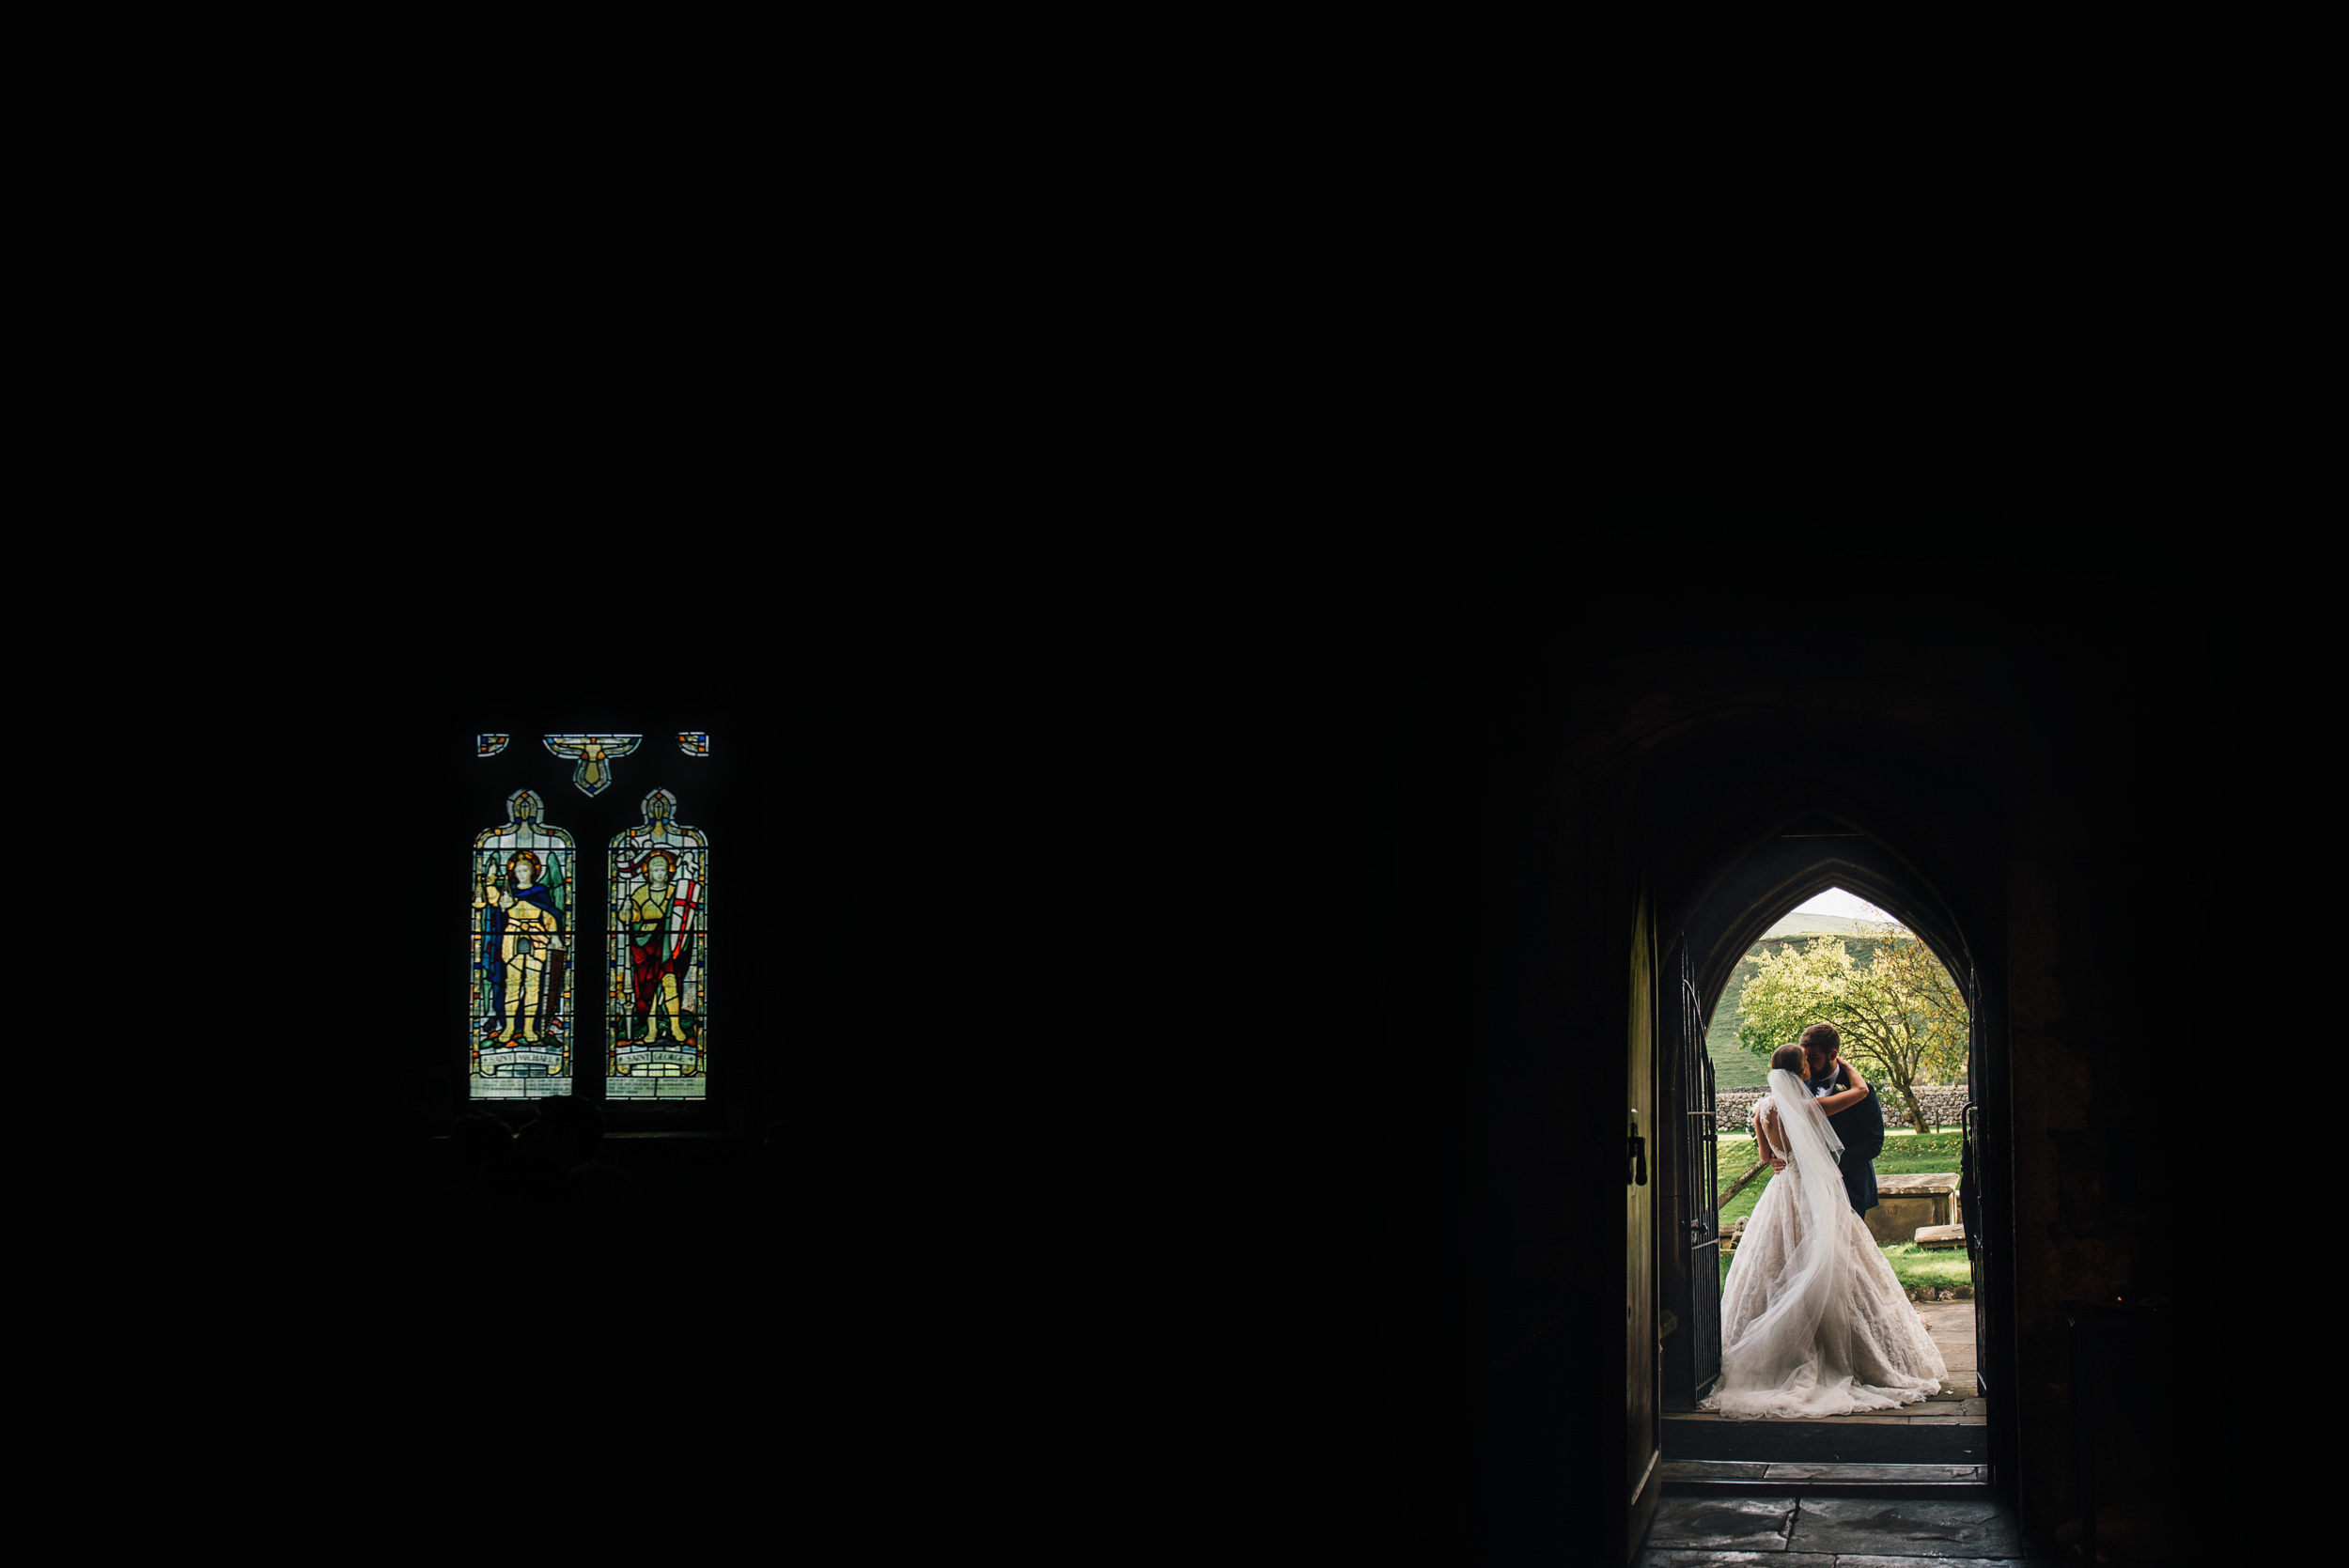 David Scholes Lancashire wedding photography 2016-43.jpg